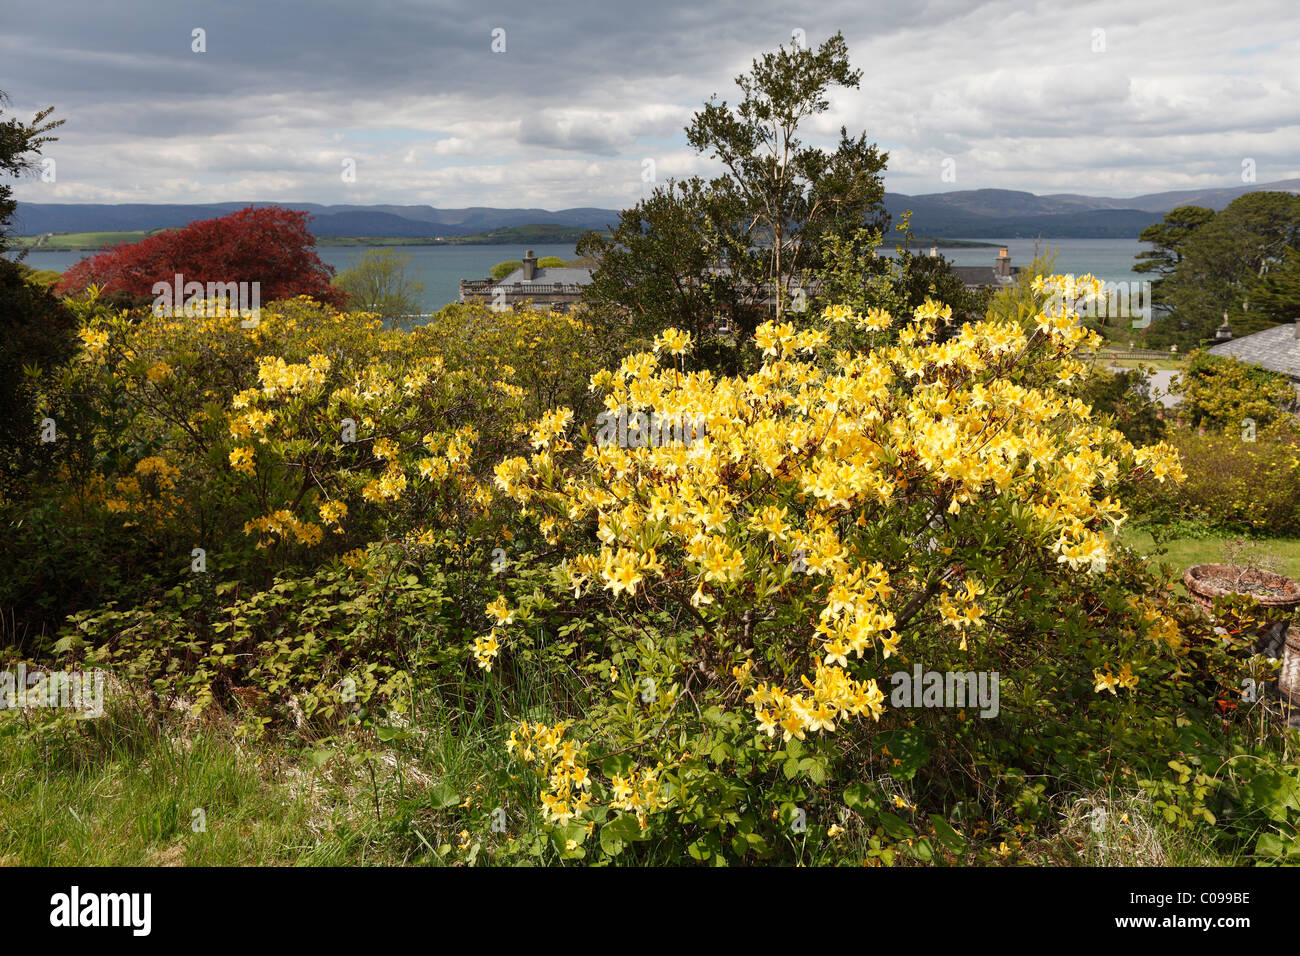 Yellow flowering rhododendron, Bantry House, West Cork, Republic of Ireland, British Isles, Europe - Stock Image